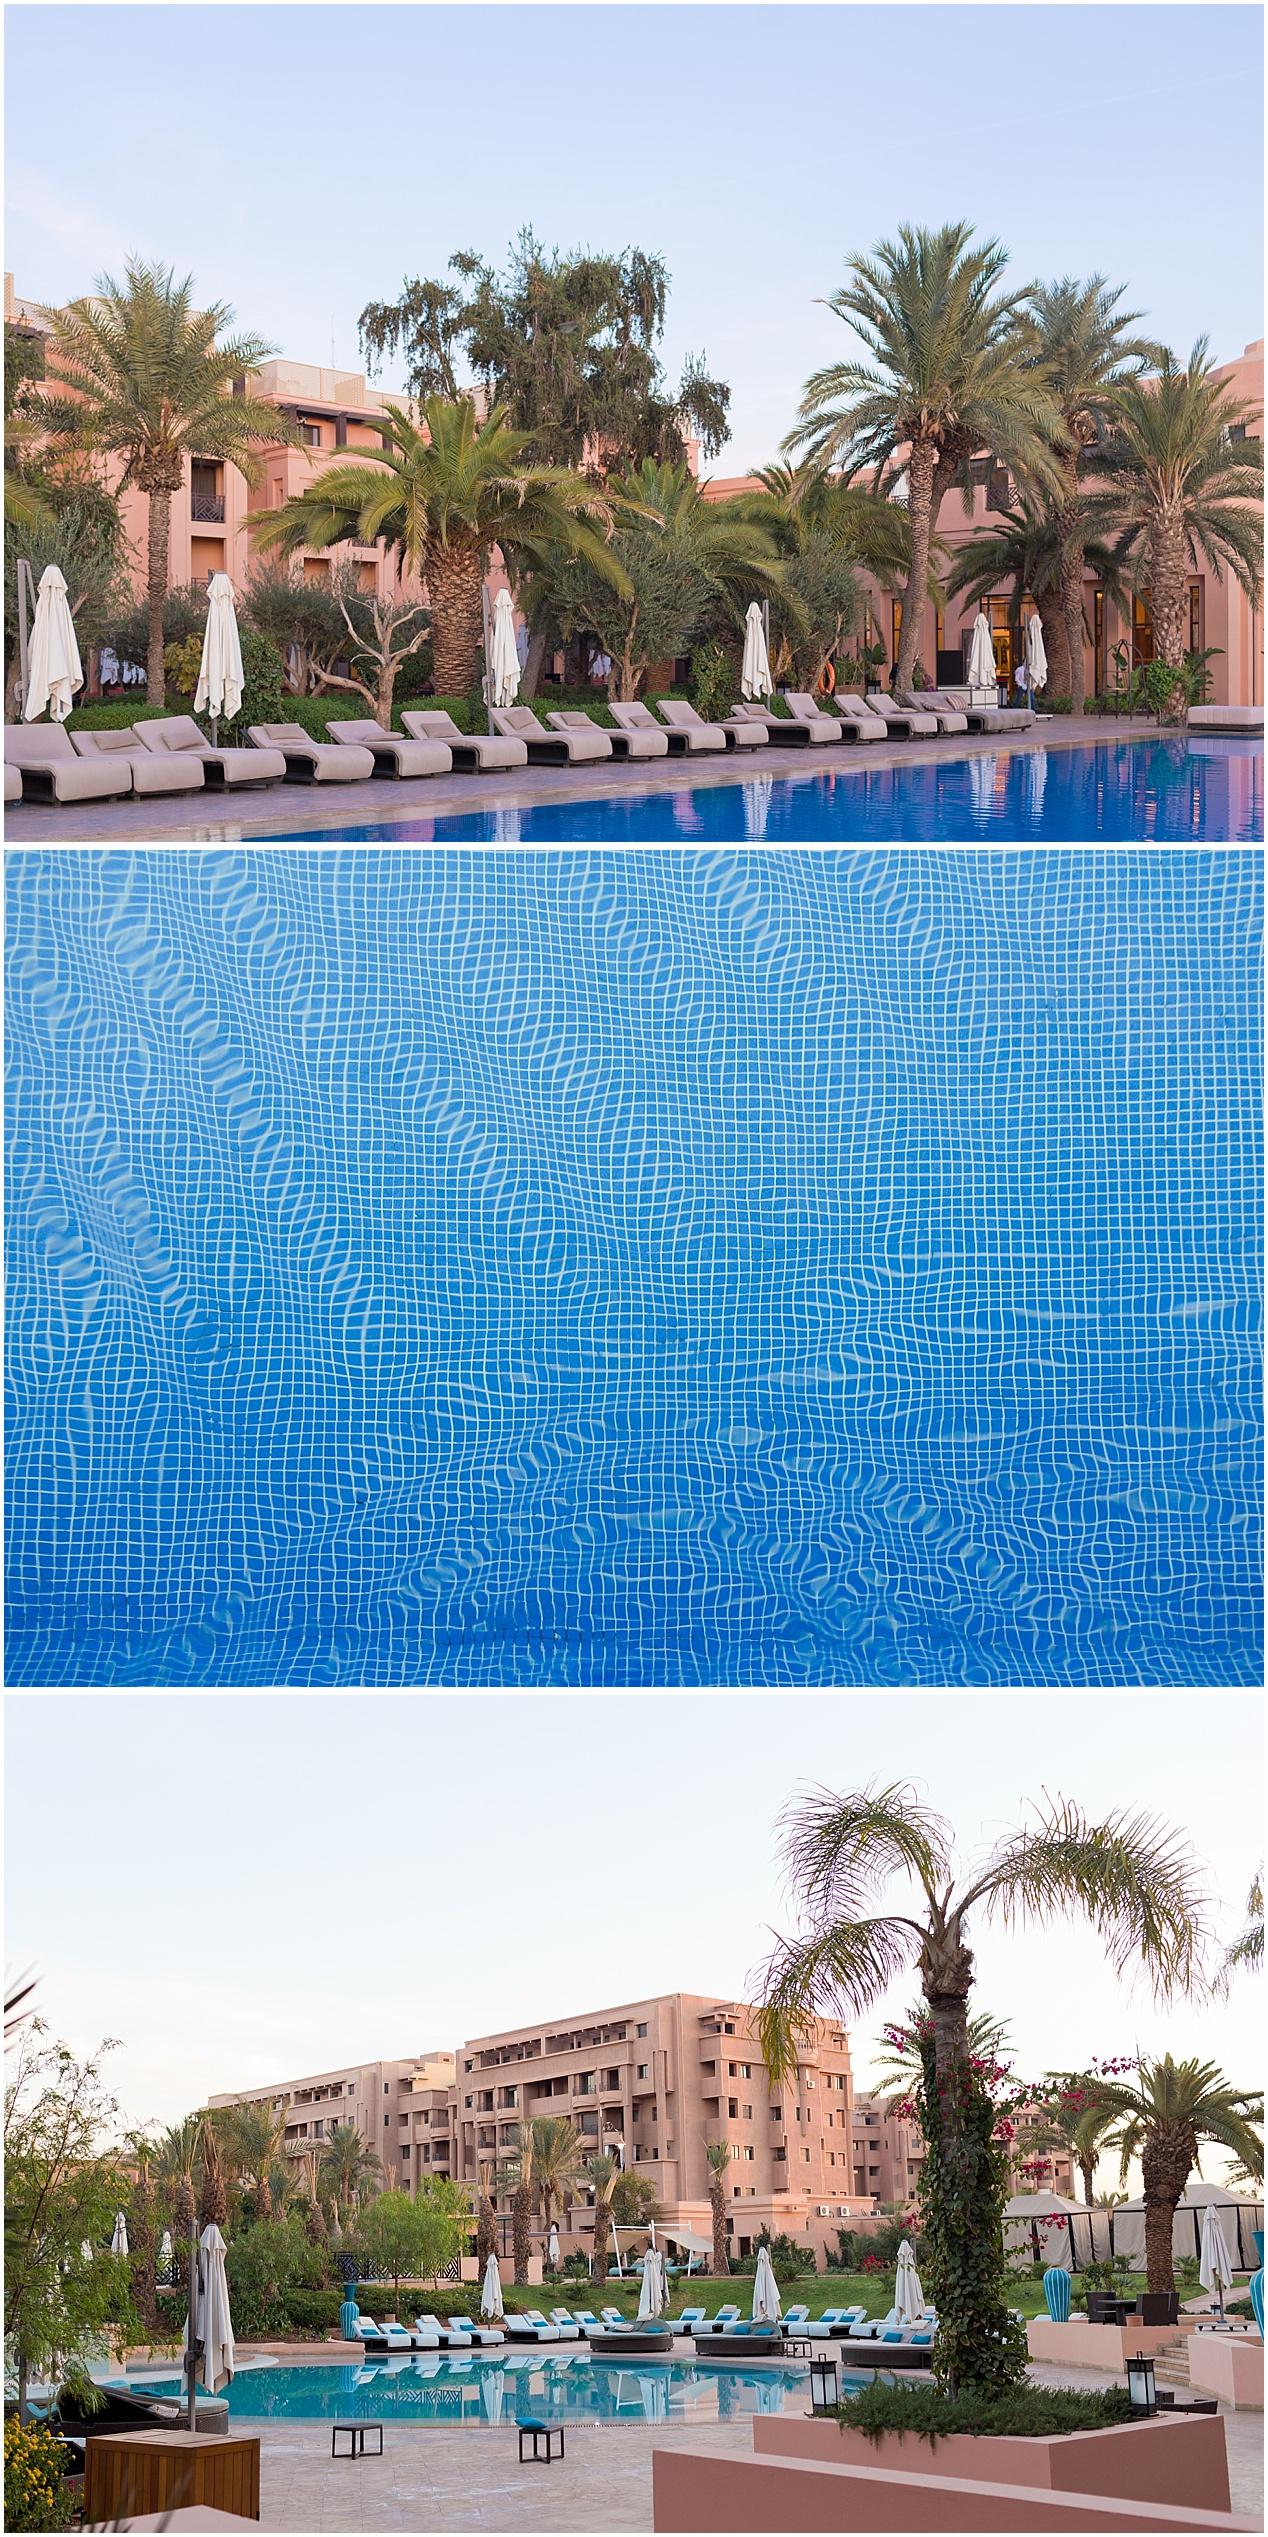 beautiful pool at Morocco hotel - Movenpick Marrakesh